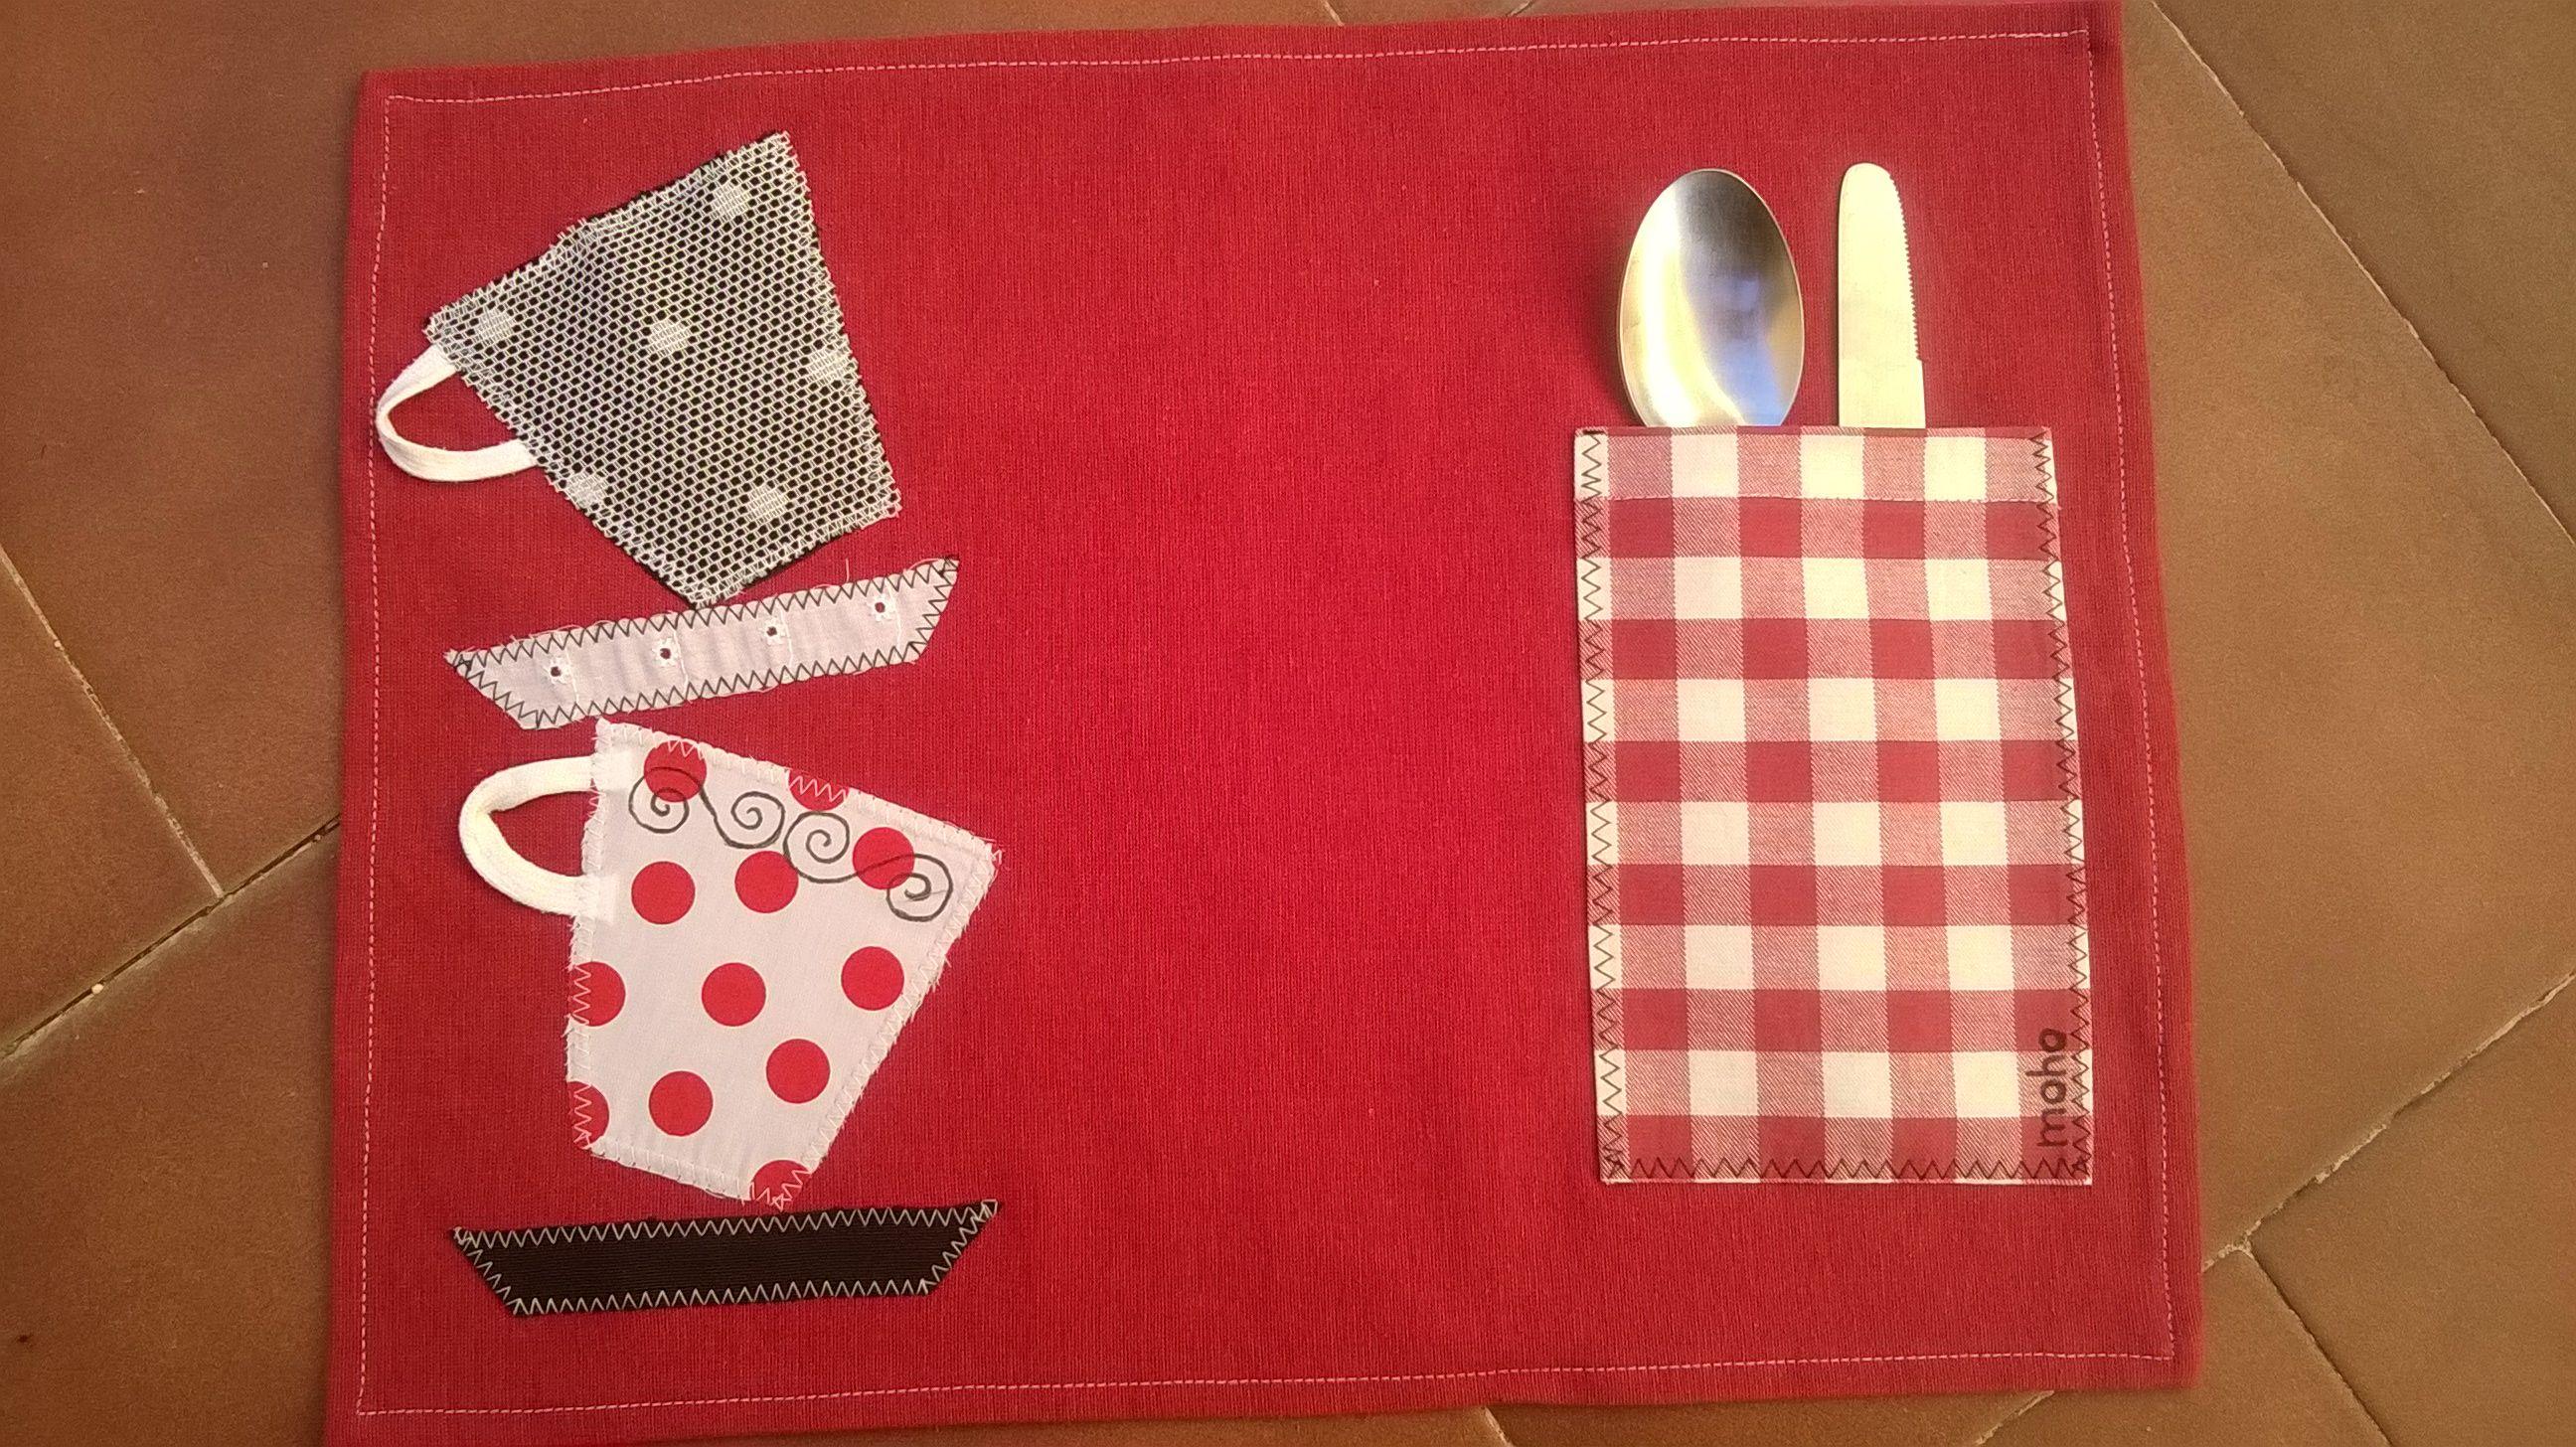 Manteles individuales para una mesa m s divertida y original patchwork pinterest manteles - Manteles originales ...